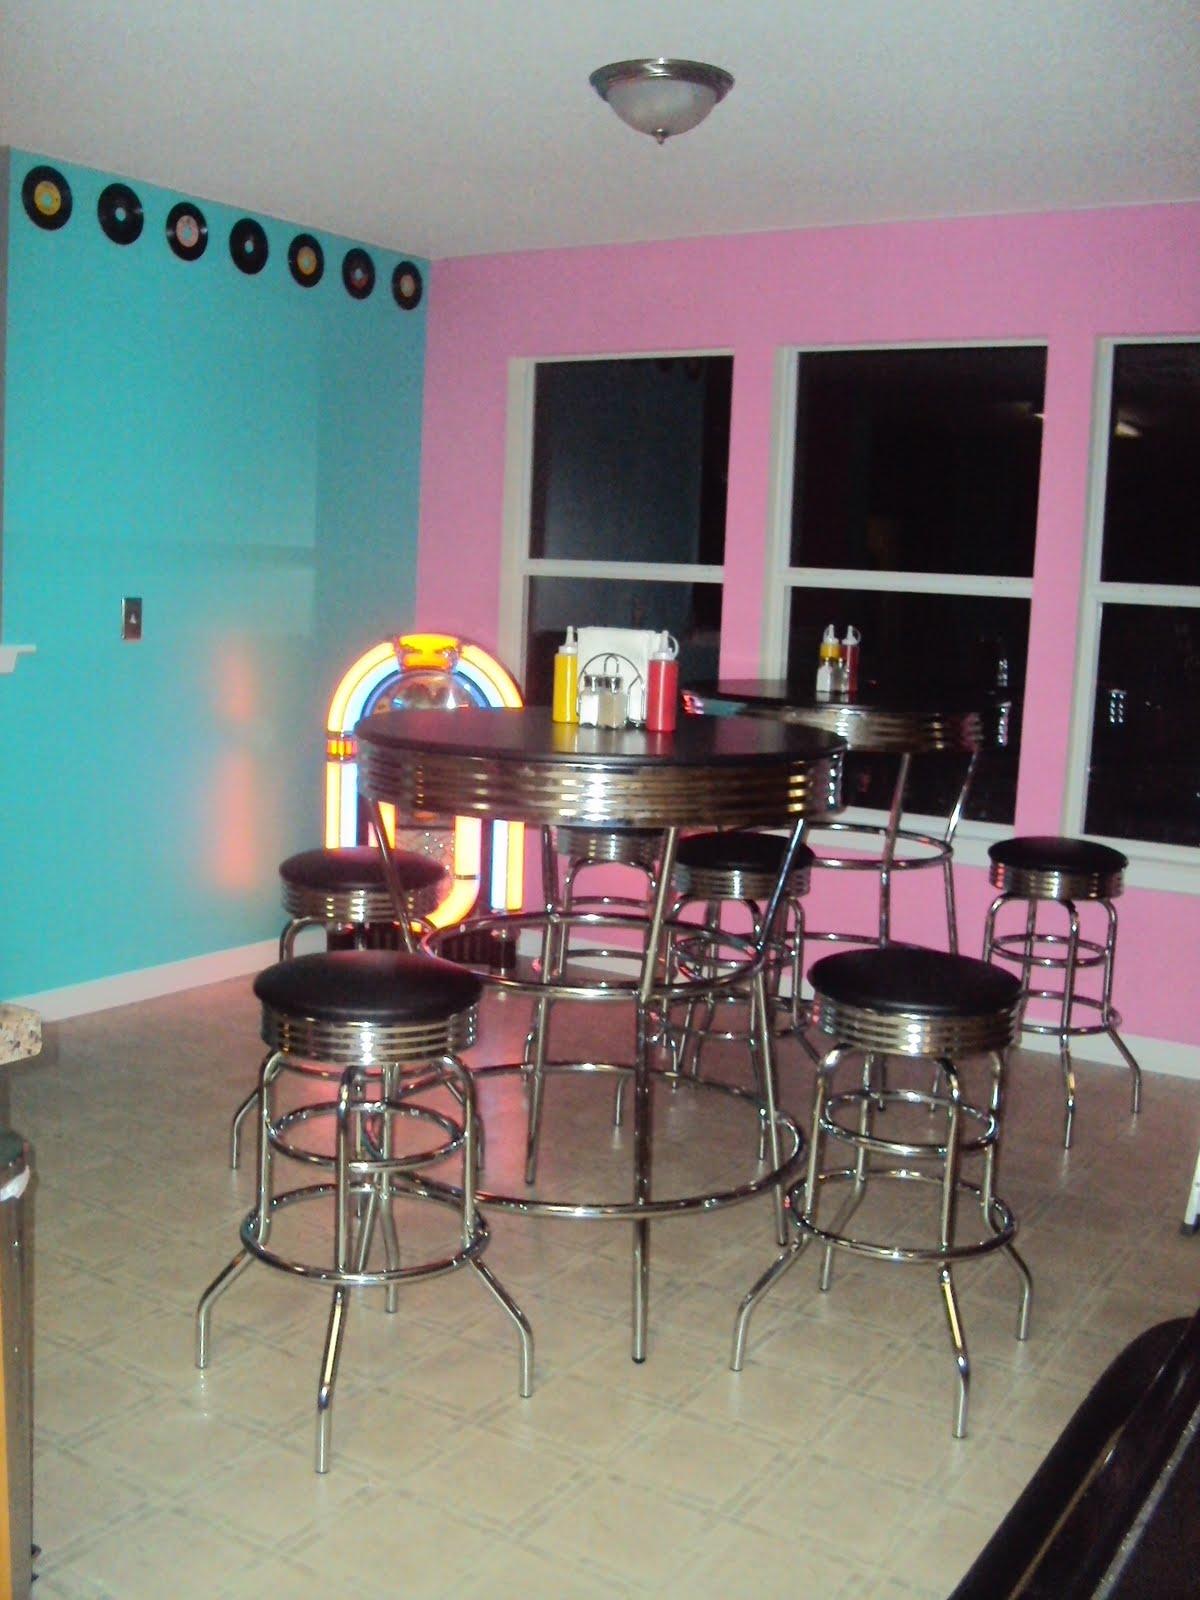 Like for Kitchen diner decor